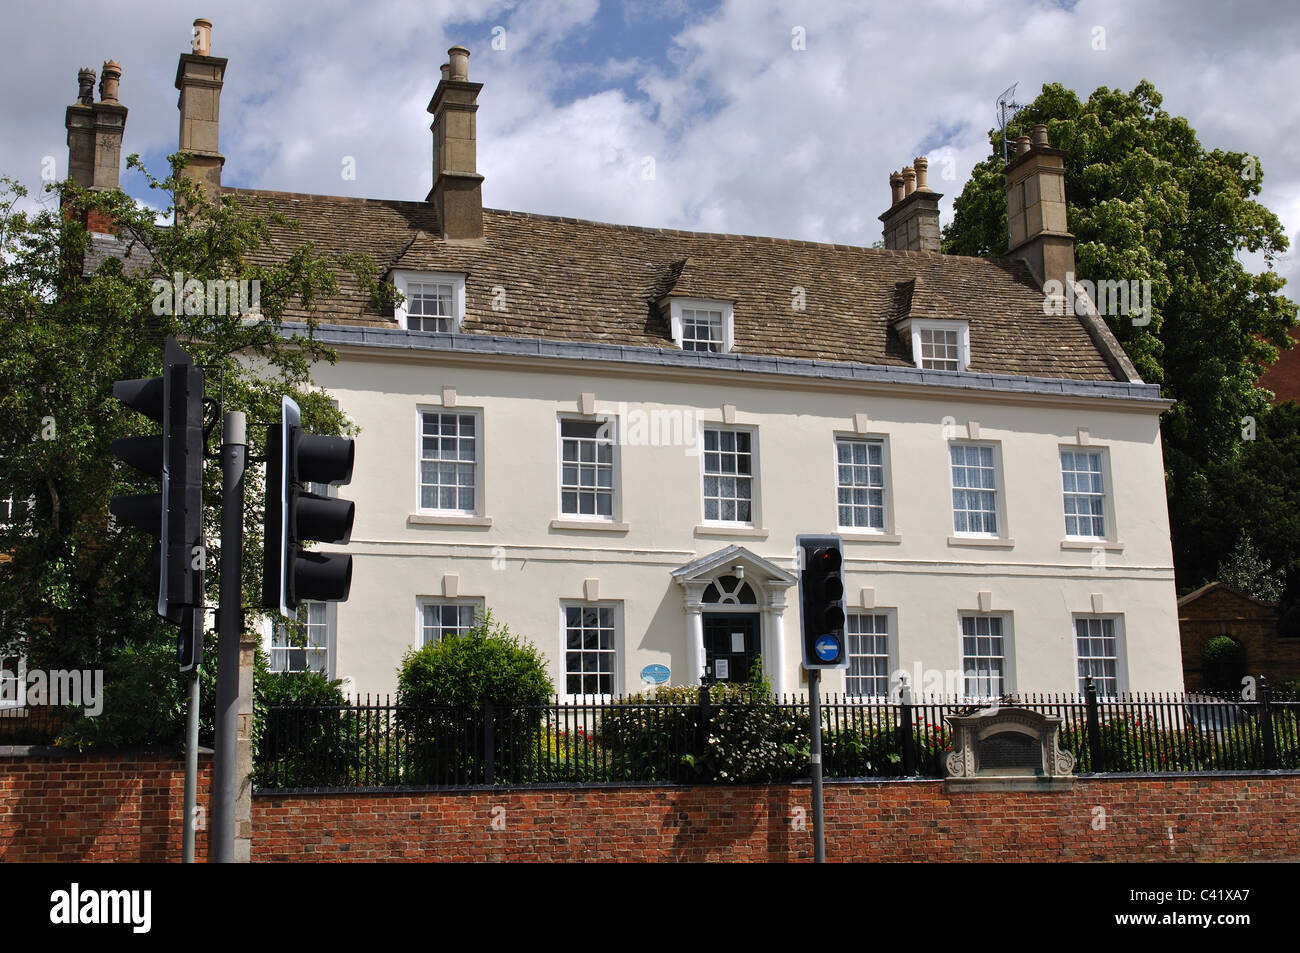 Die ehemaligen Missionshaus Carey, Kettering, Northamptonshire, England, UK Stockbild